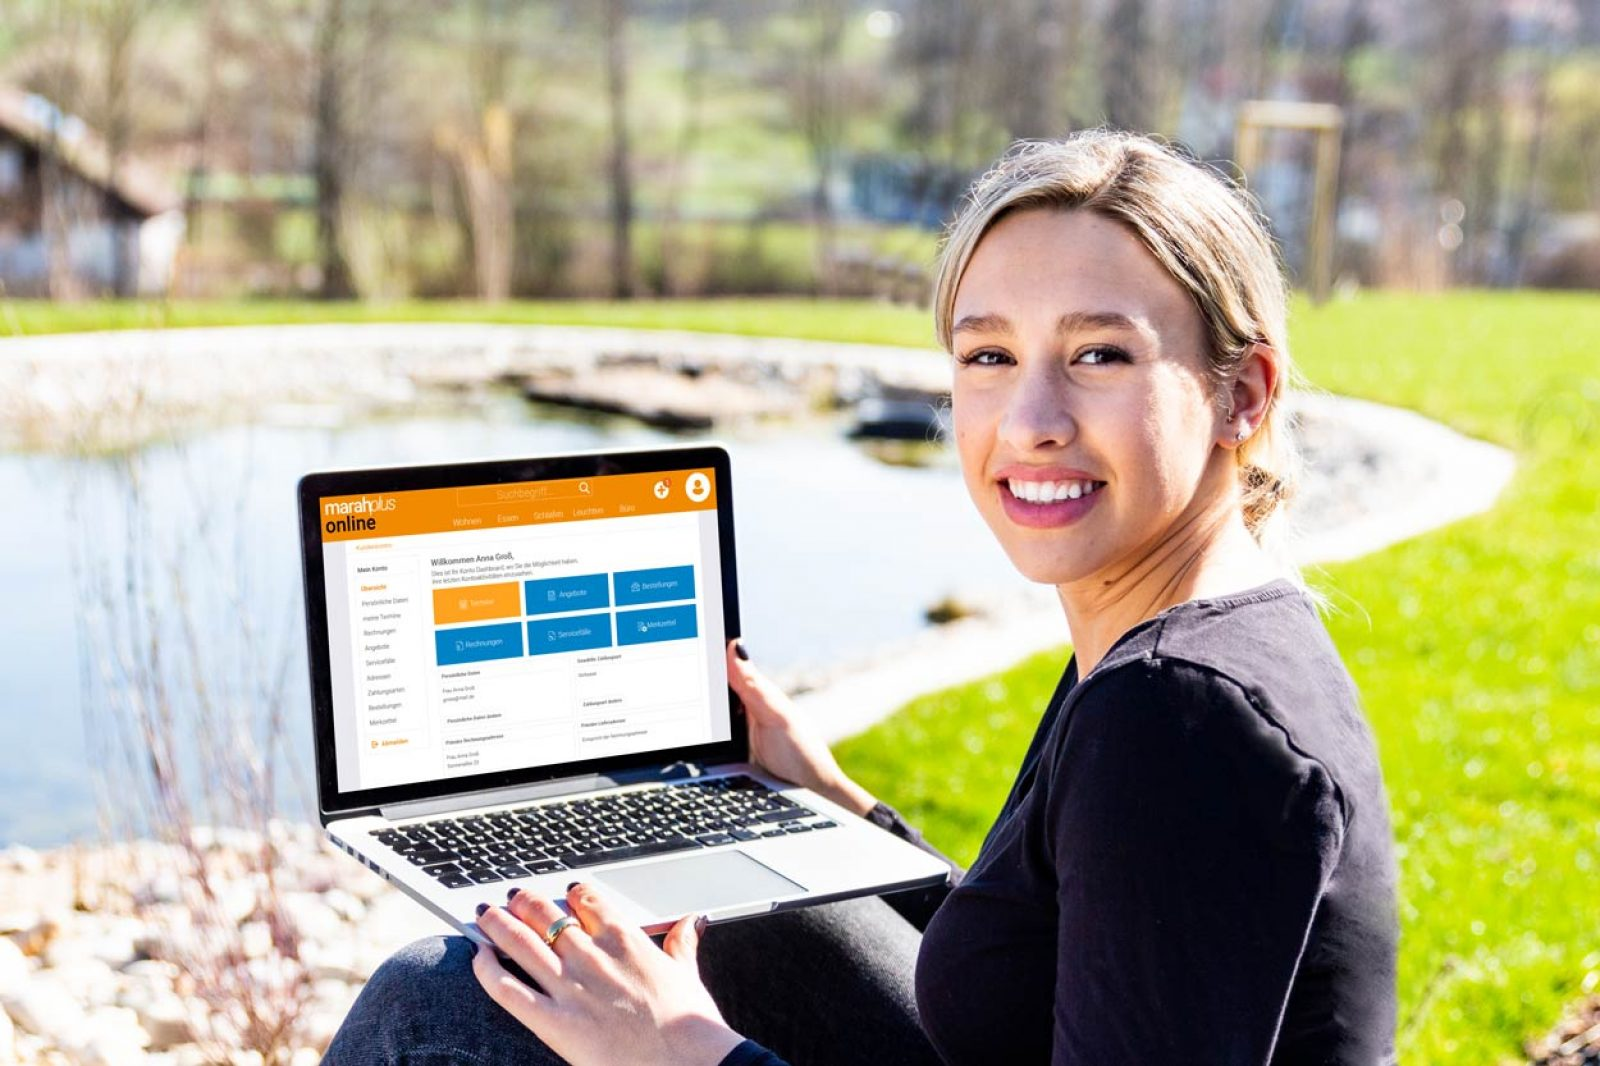 kundenauskunft_online_dah_laptop